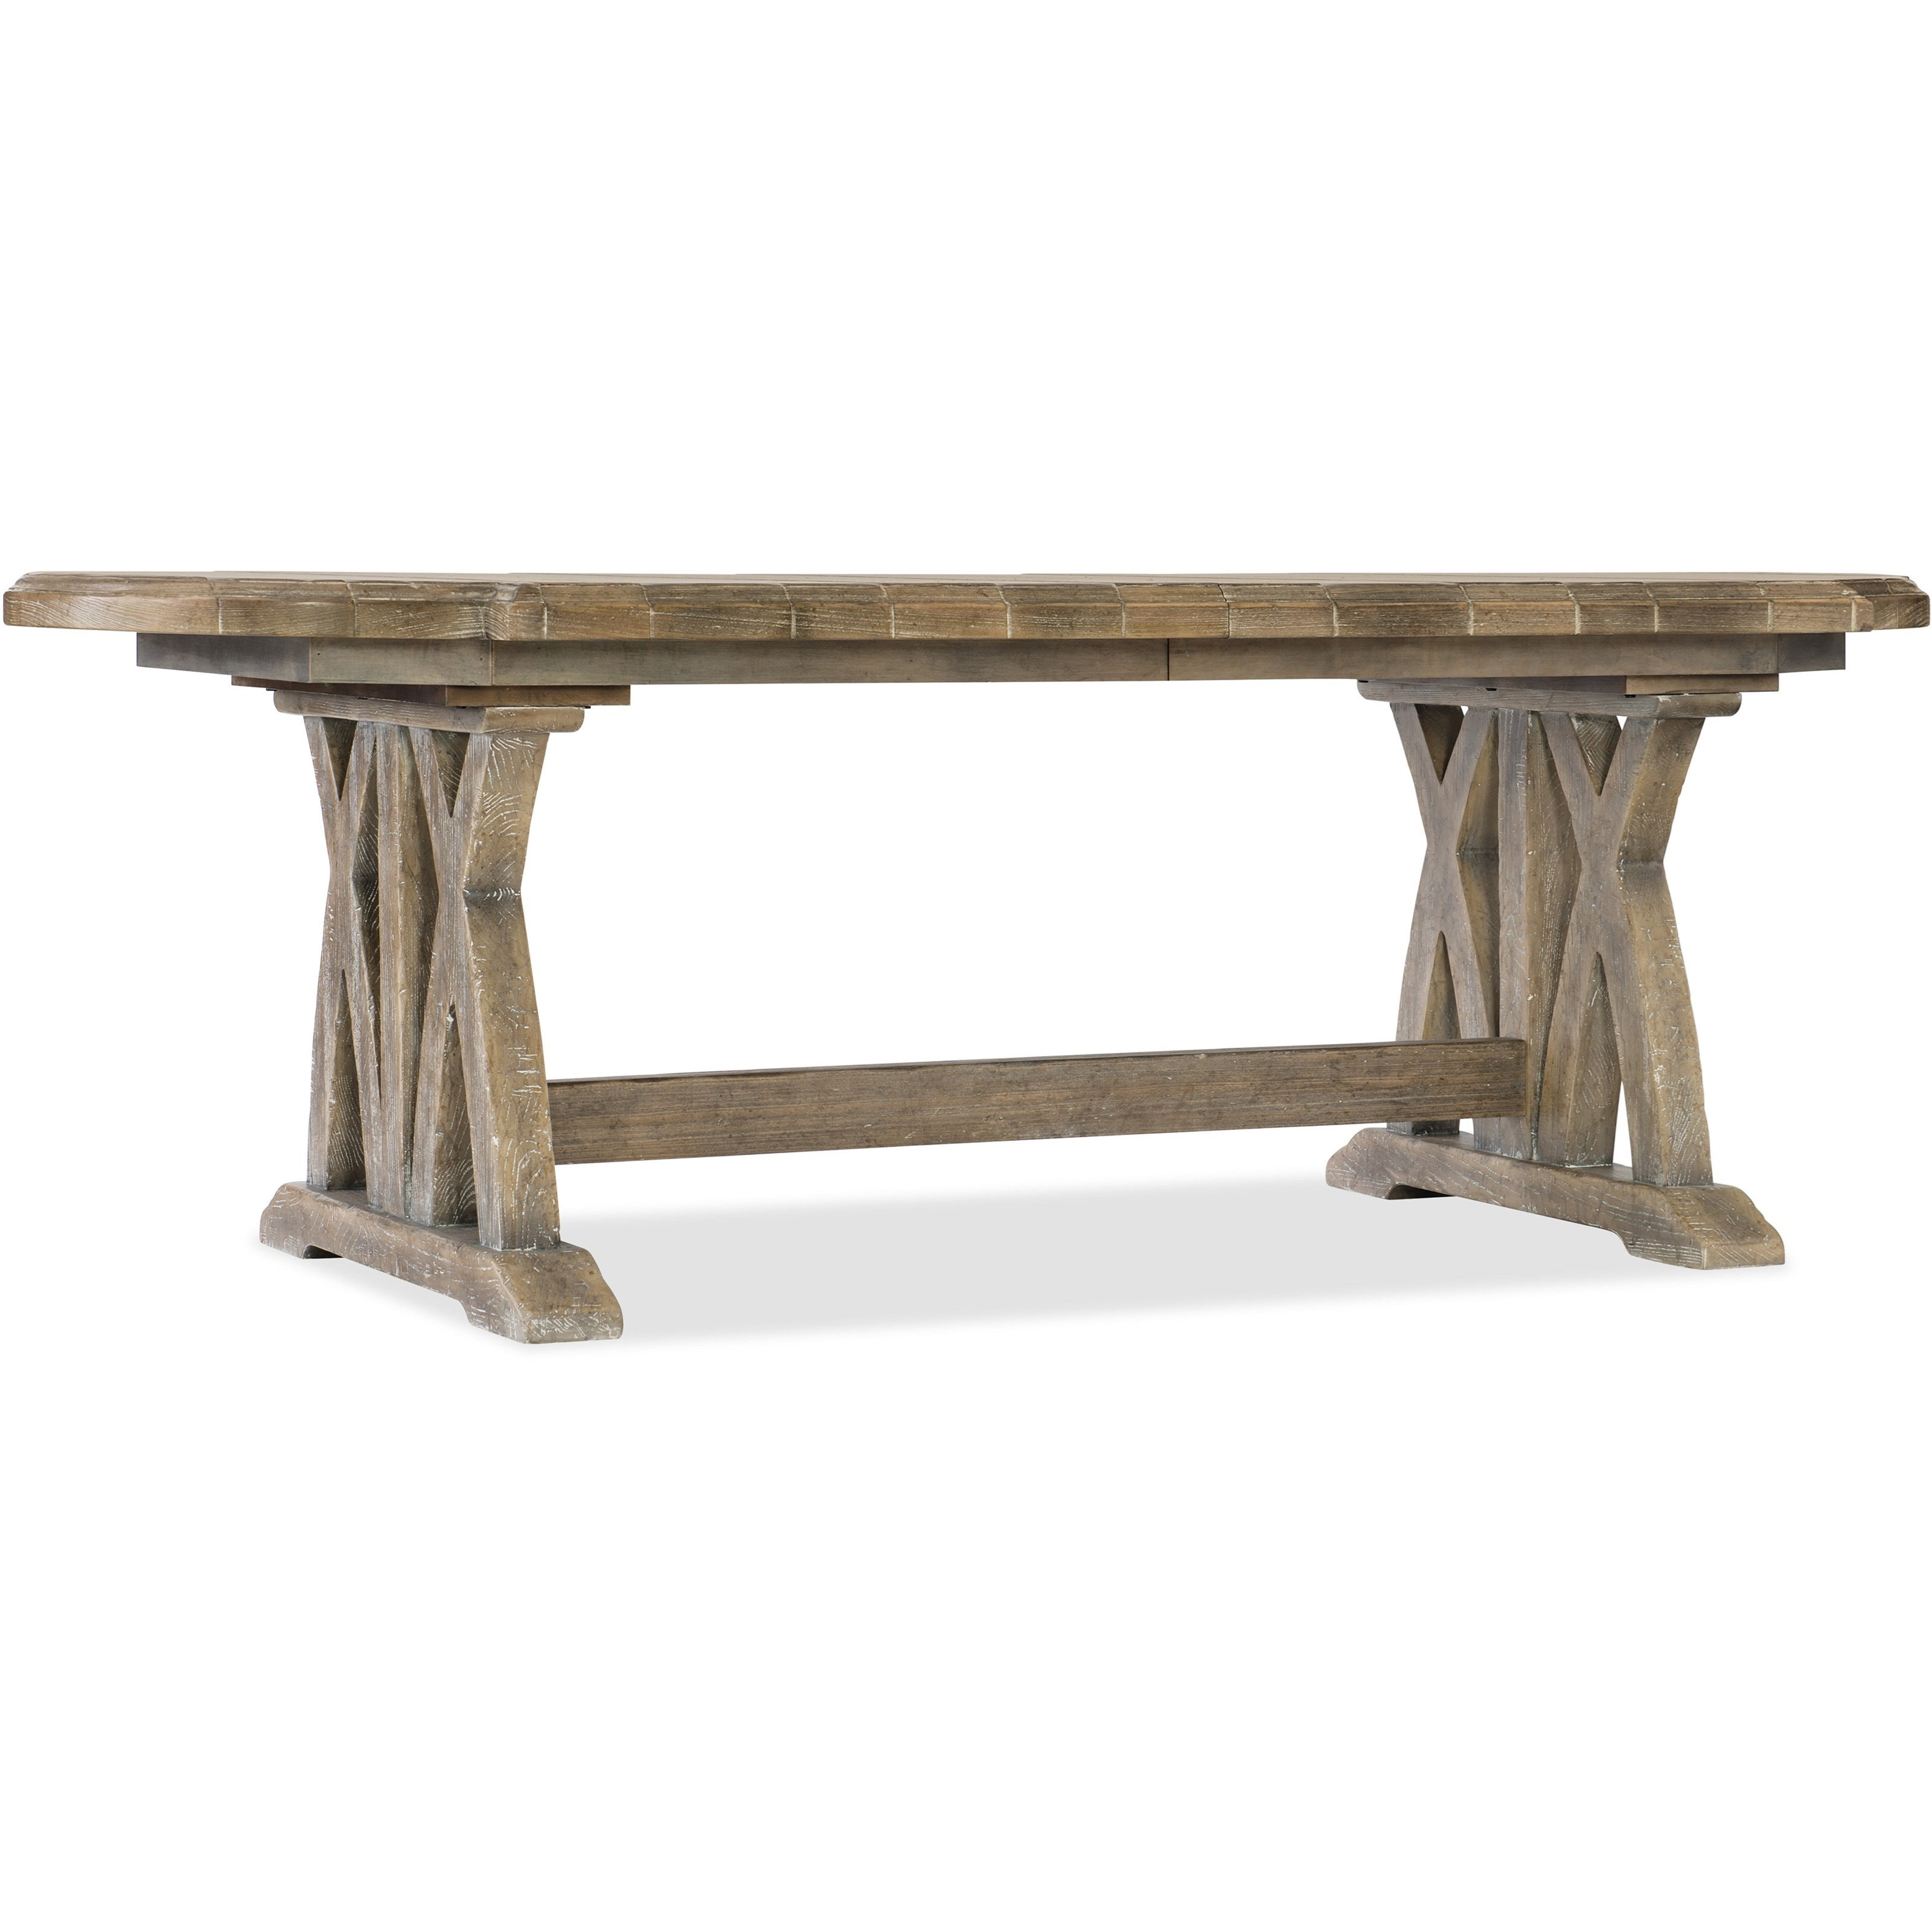 "Boheme Colibri 88"" Trestle Dining Table by Hooker Furniture at Stoney Creek Furniture"